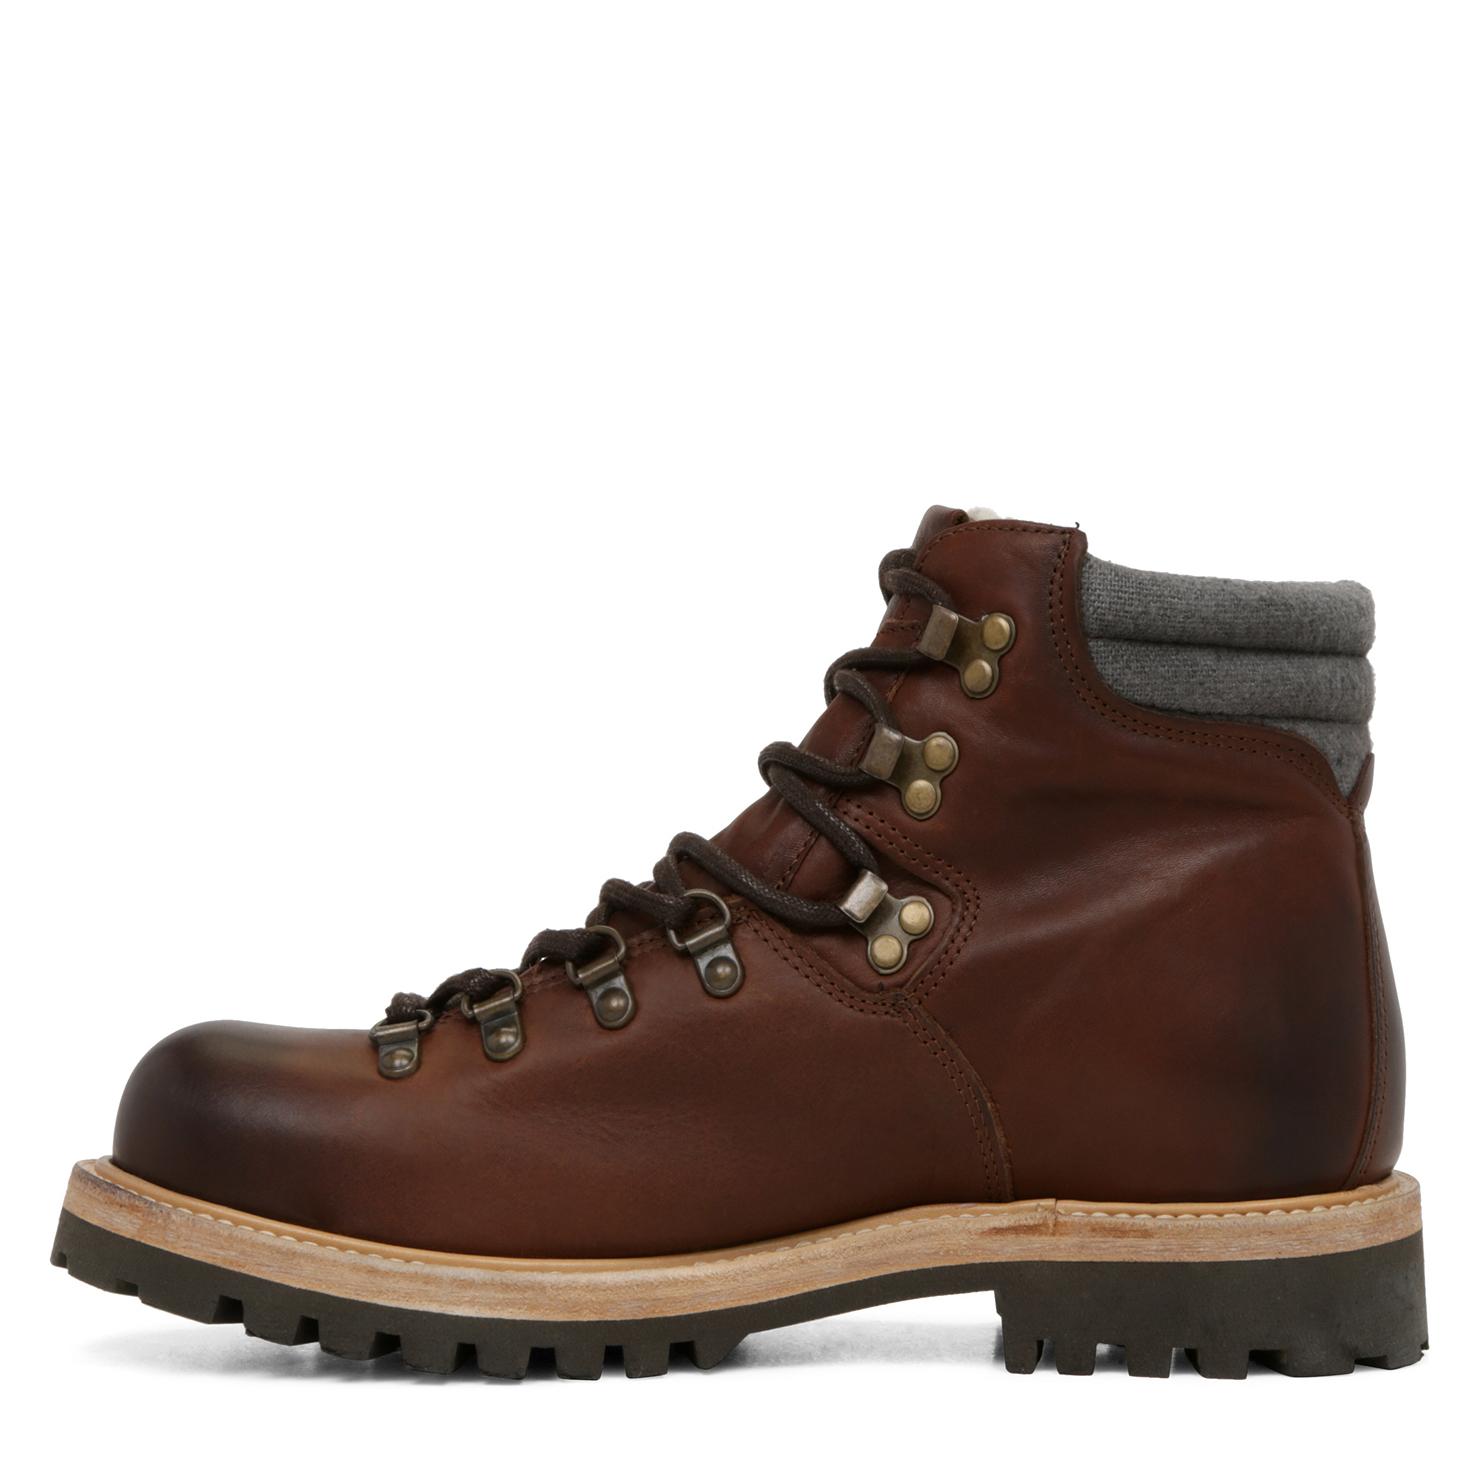 ALDO Leather Groreng in Dark Brown (Brown) for Men